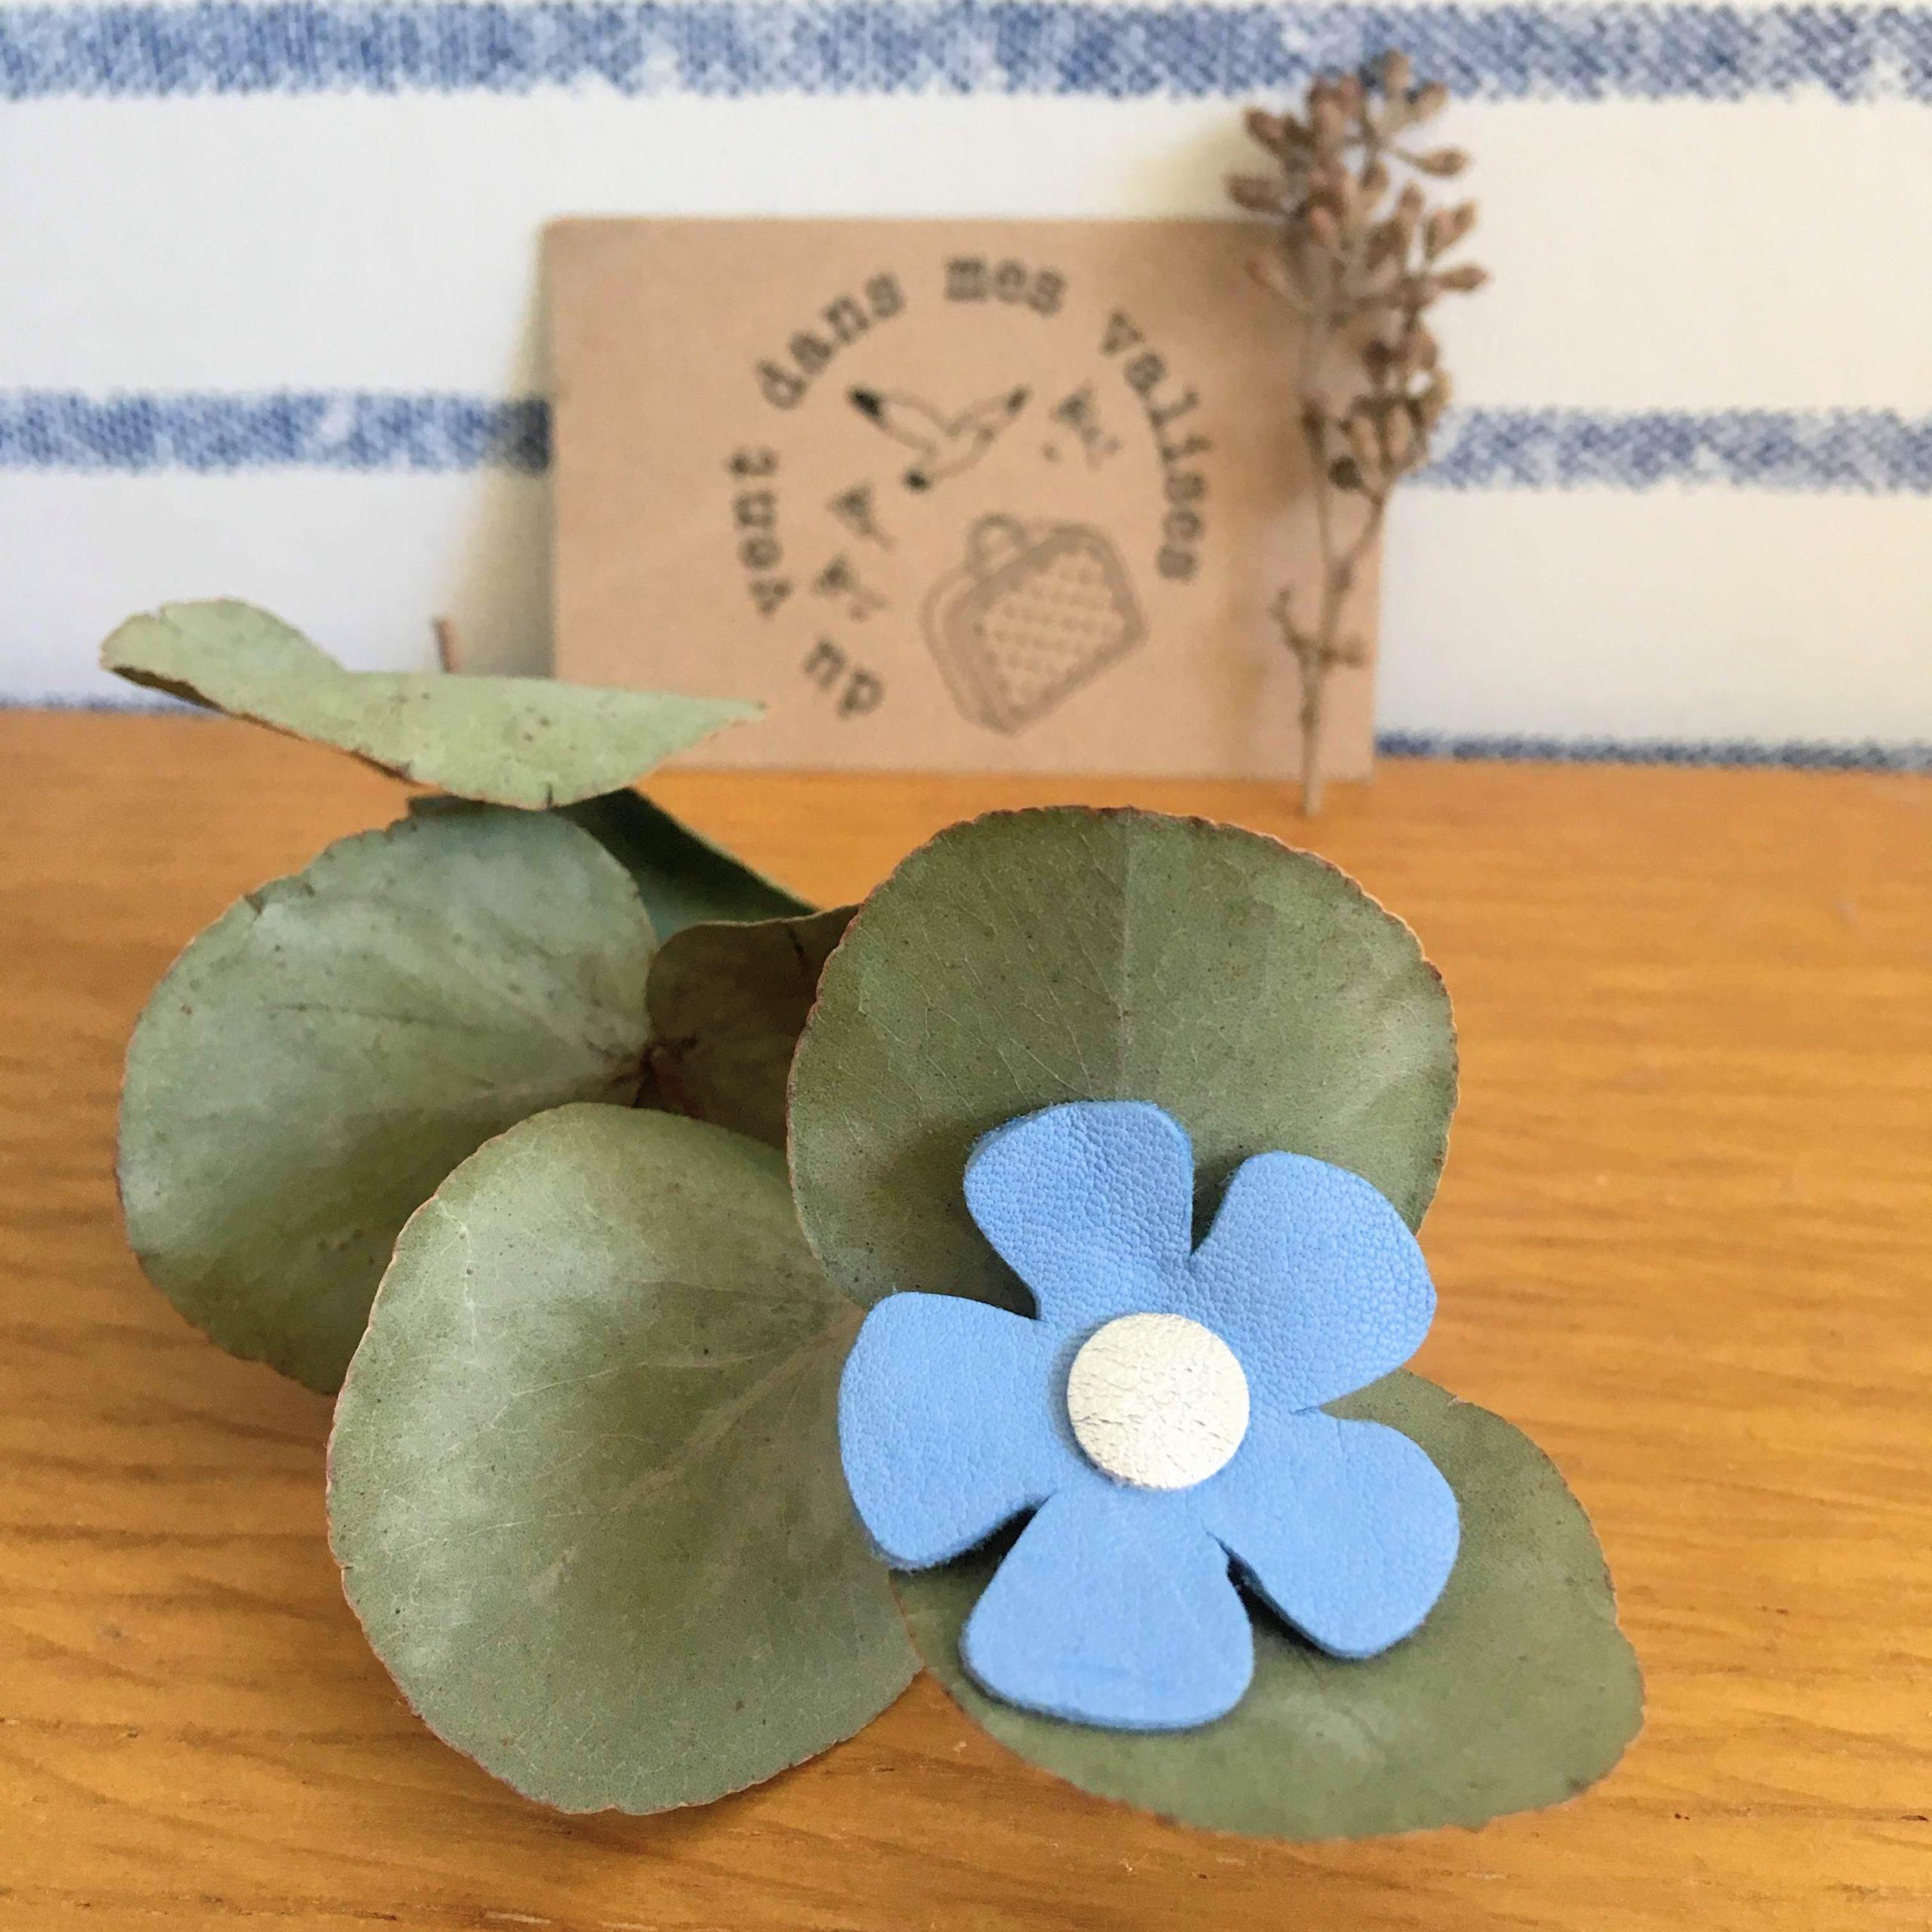 du vent dans mes valises - broche fleur de lin made in France